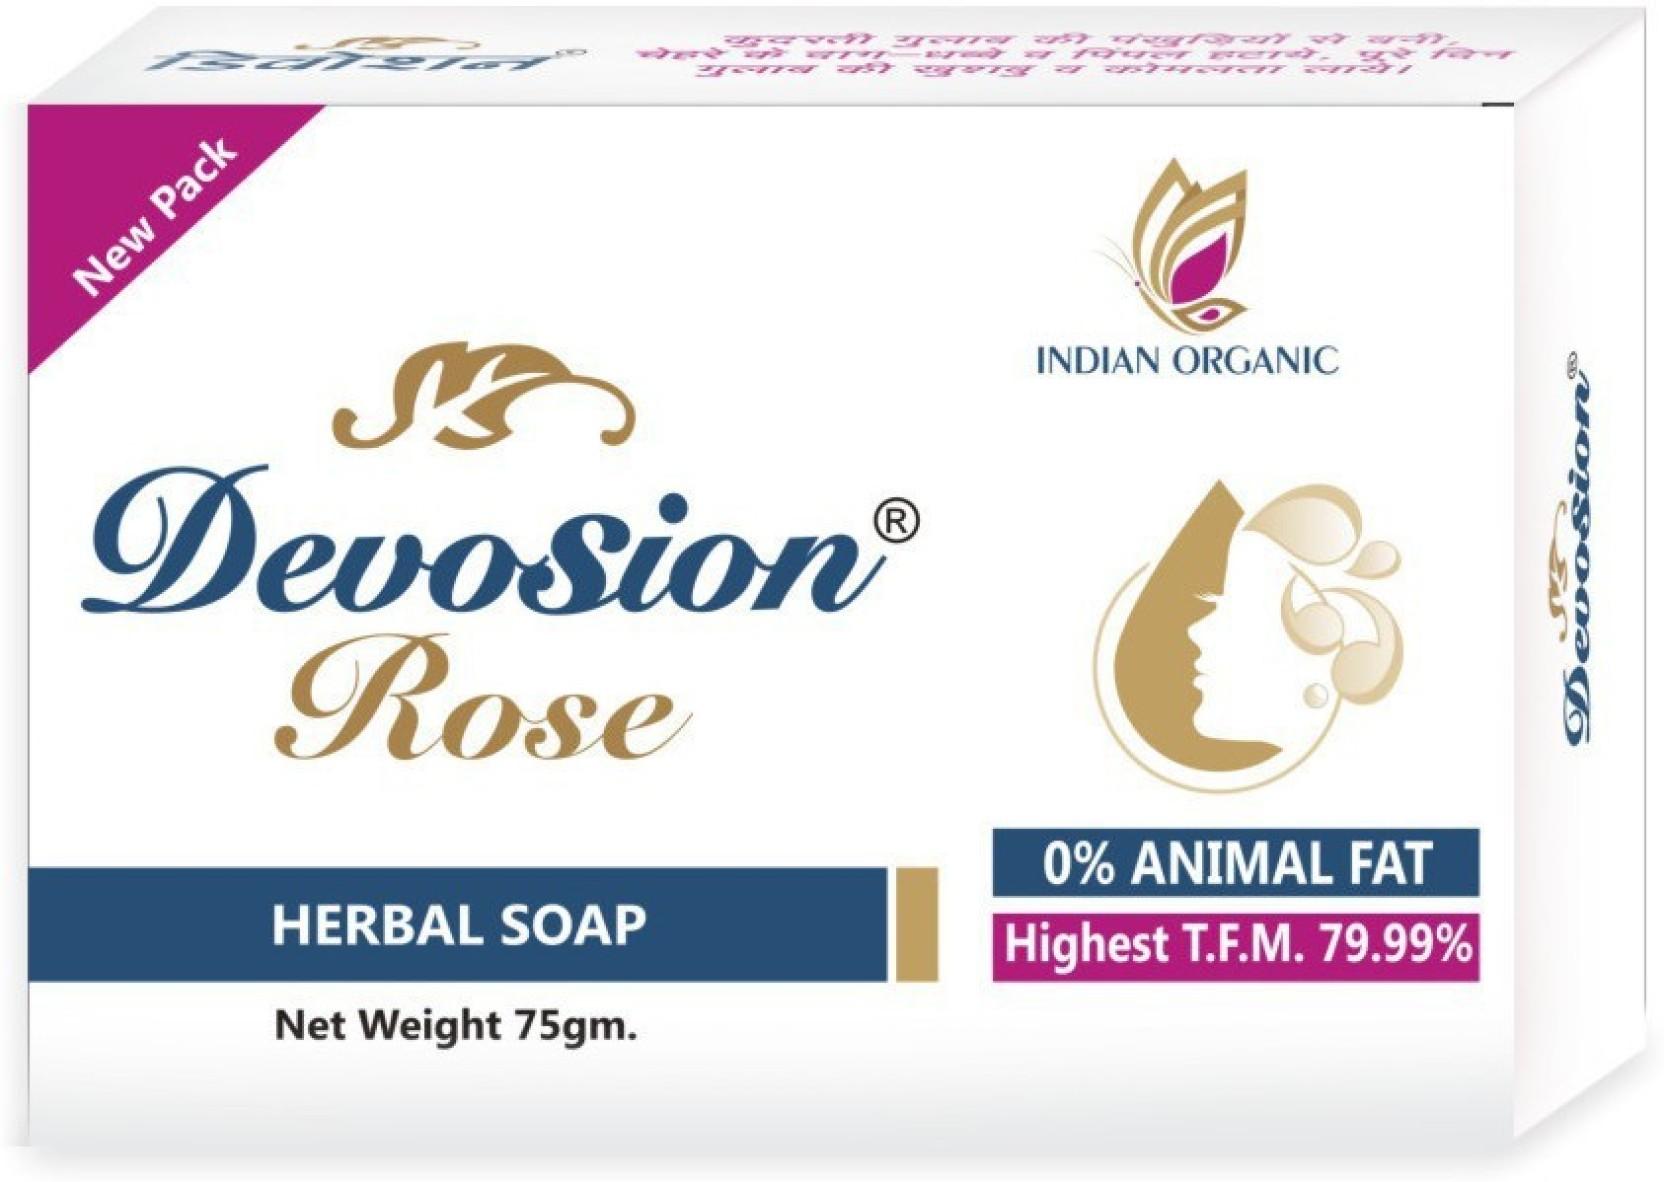 Devosion Rose Soap Price In India Buy Online Sabun Herbal Add To Cart